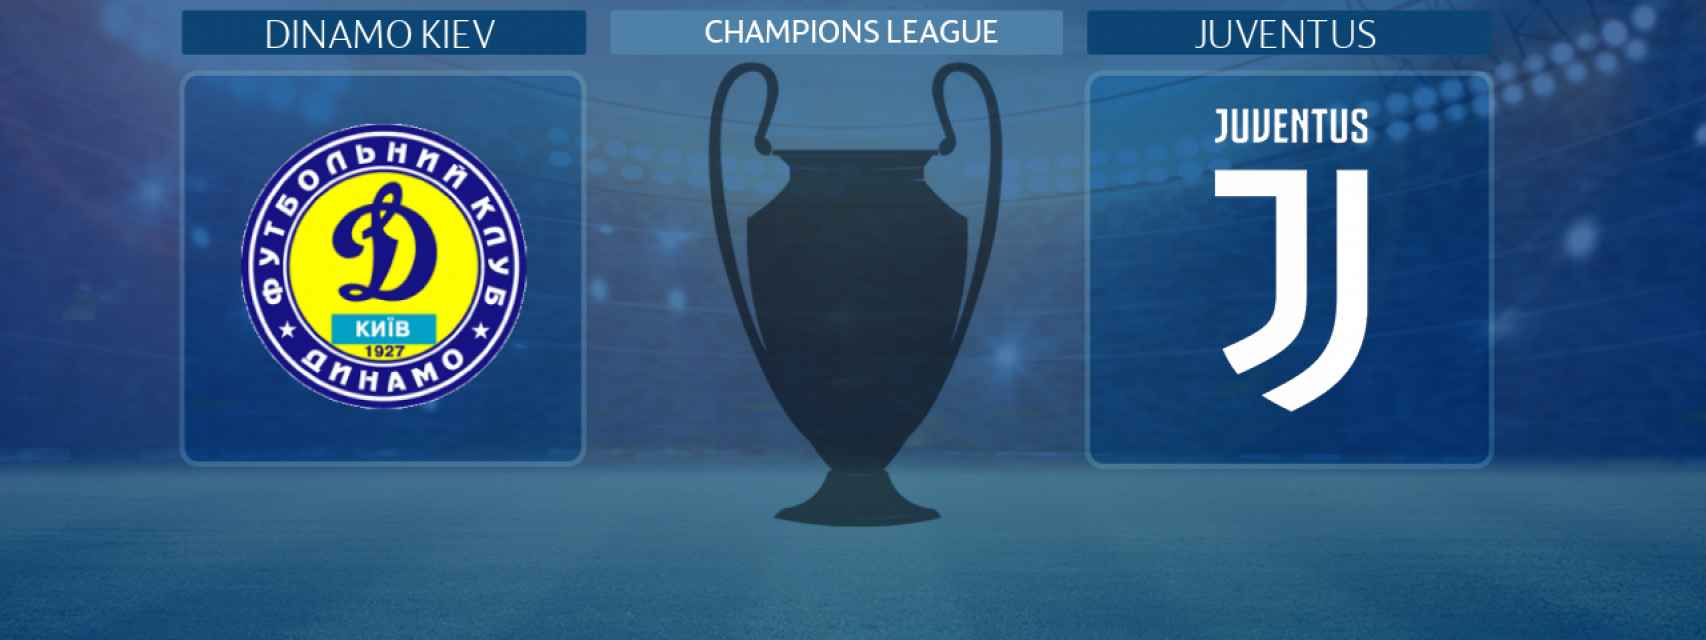 Dinamo Kiev - Juventus, partido de la Champions League